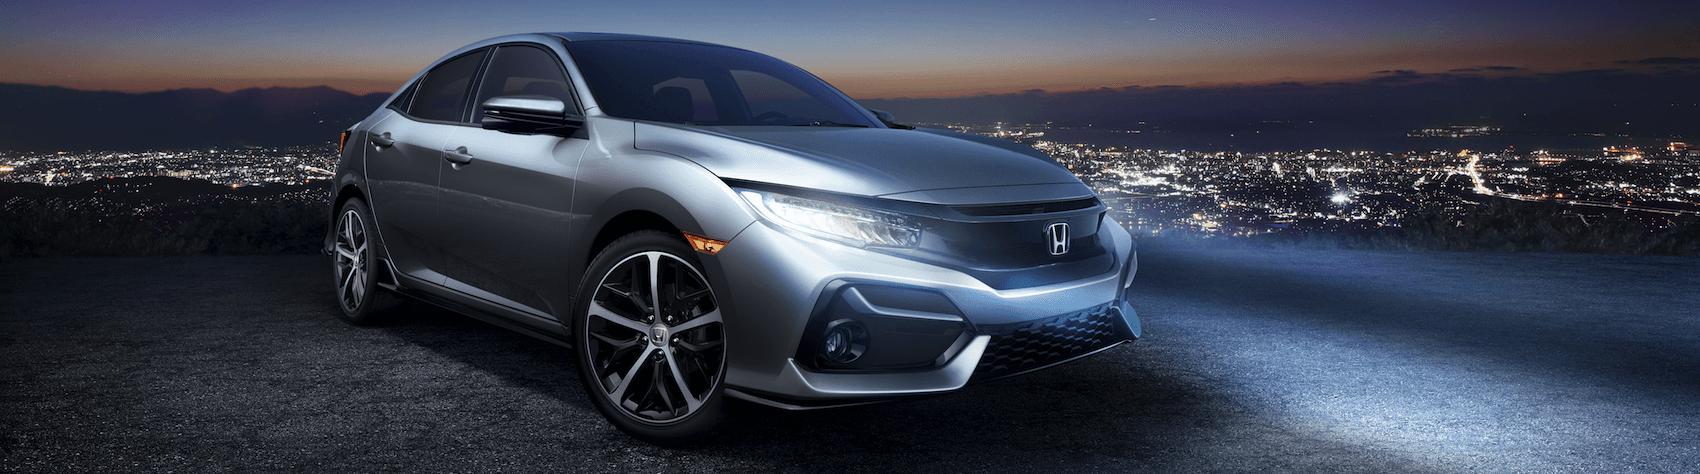 Honda Civic Battery Life